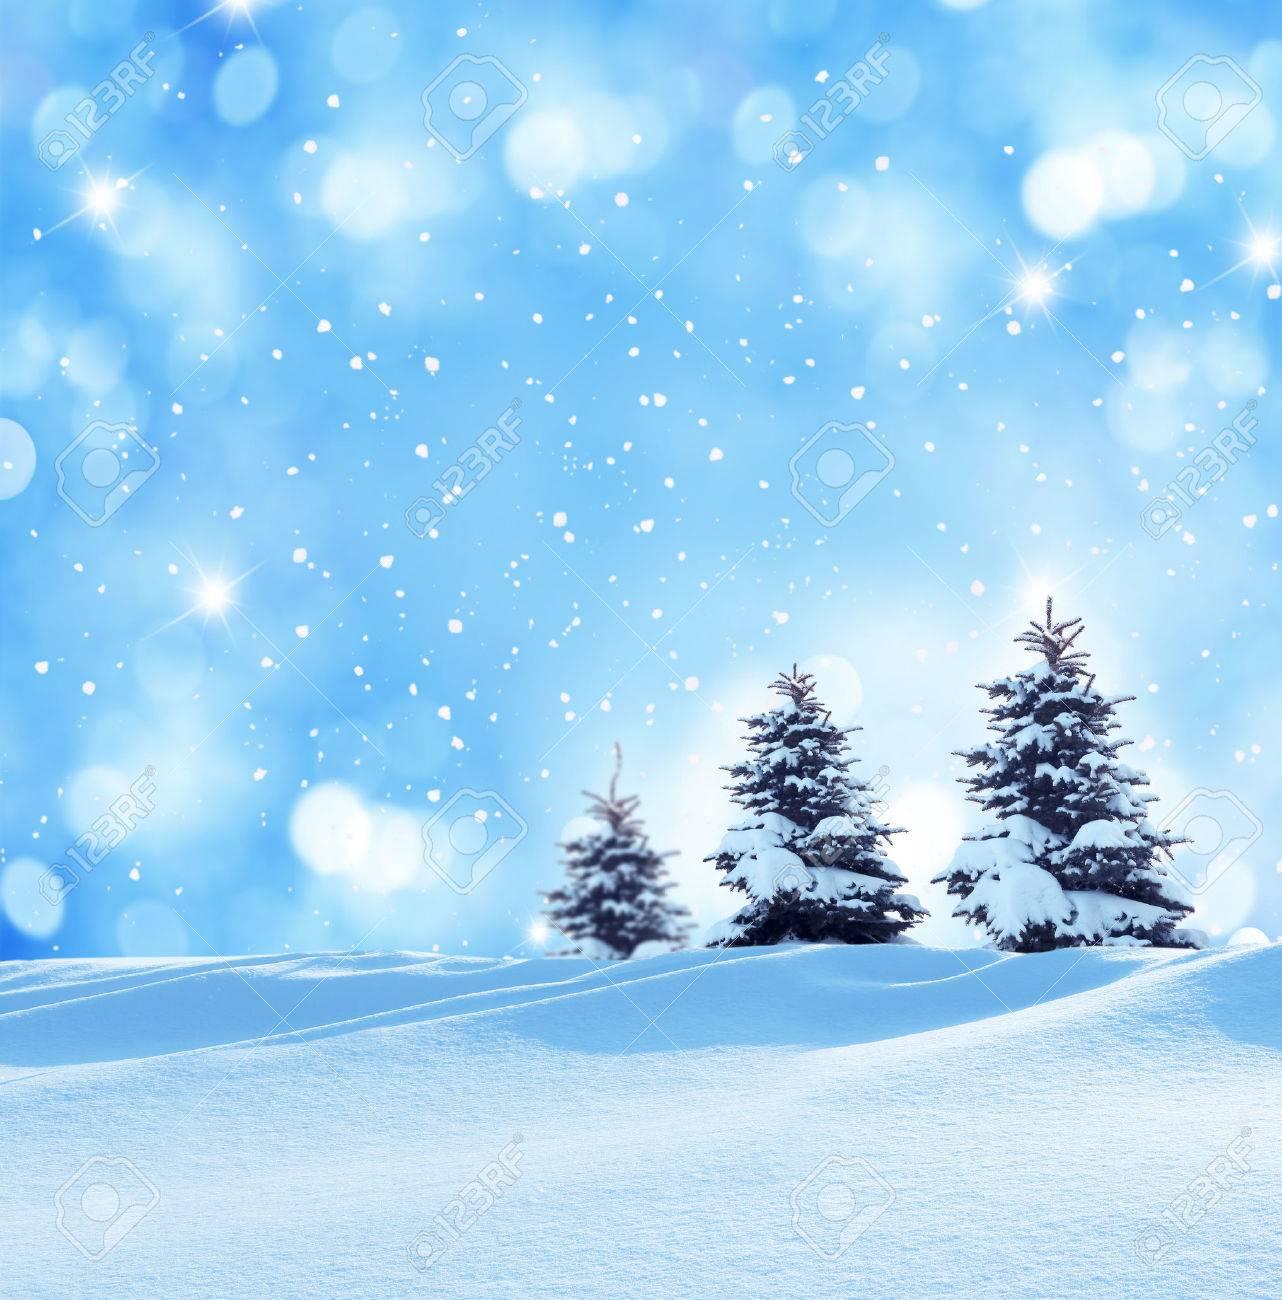 winter christmas landscape - 33971743